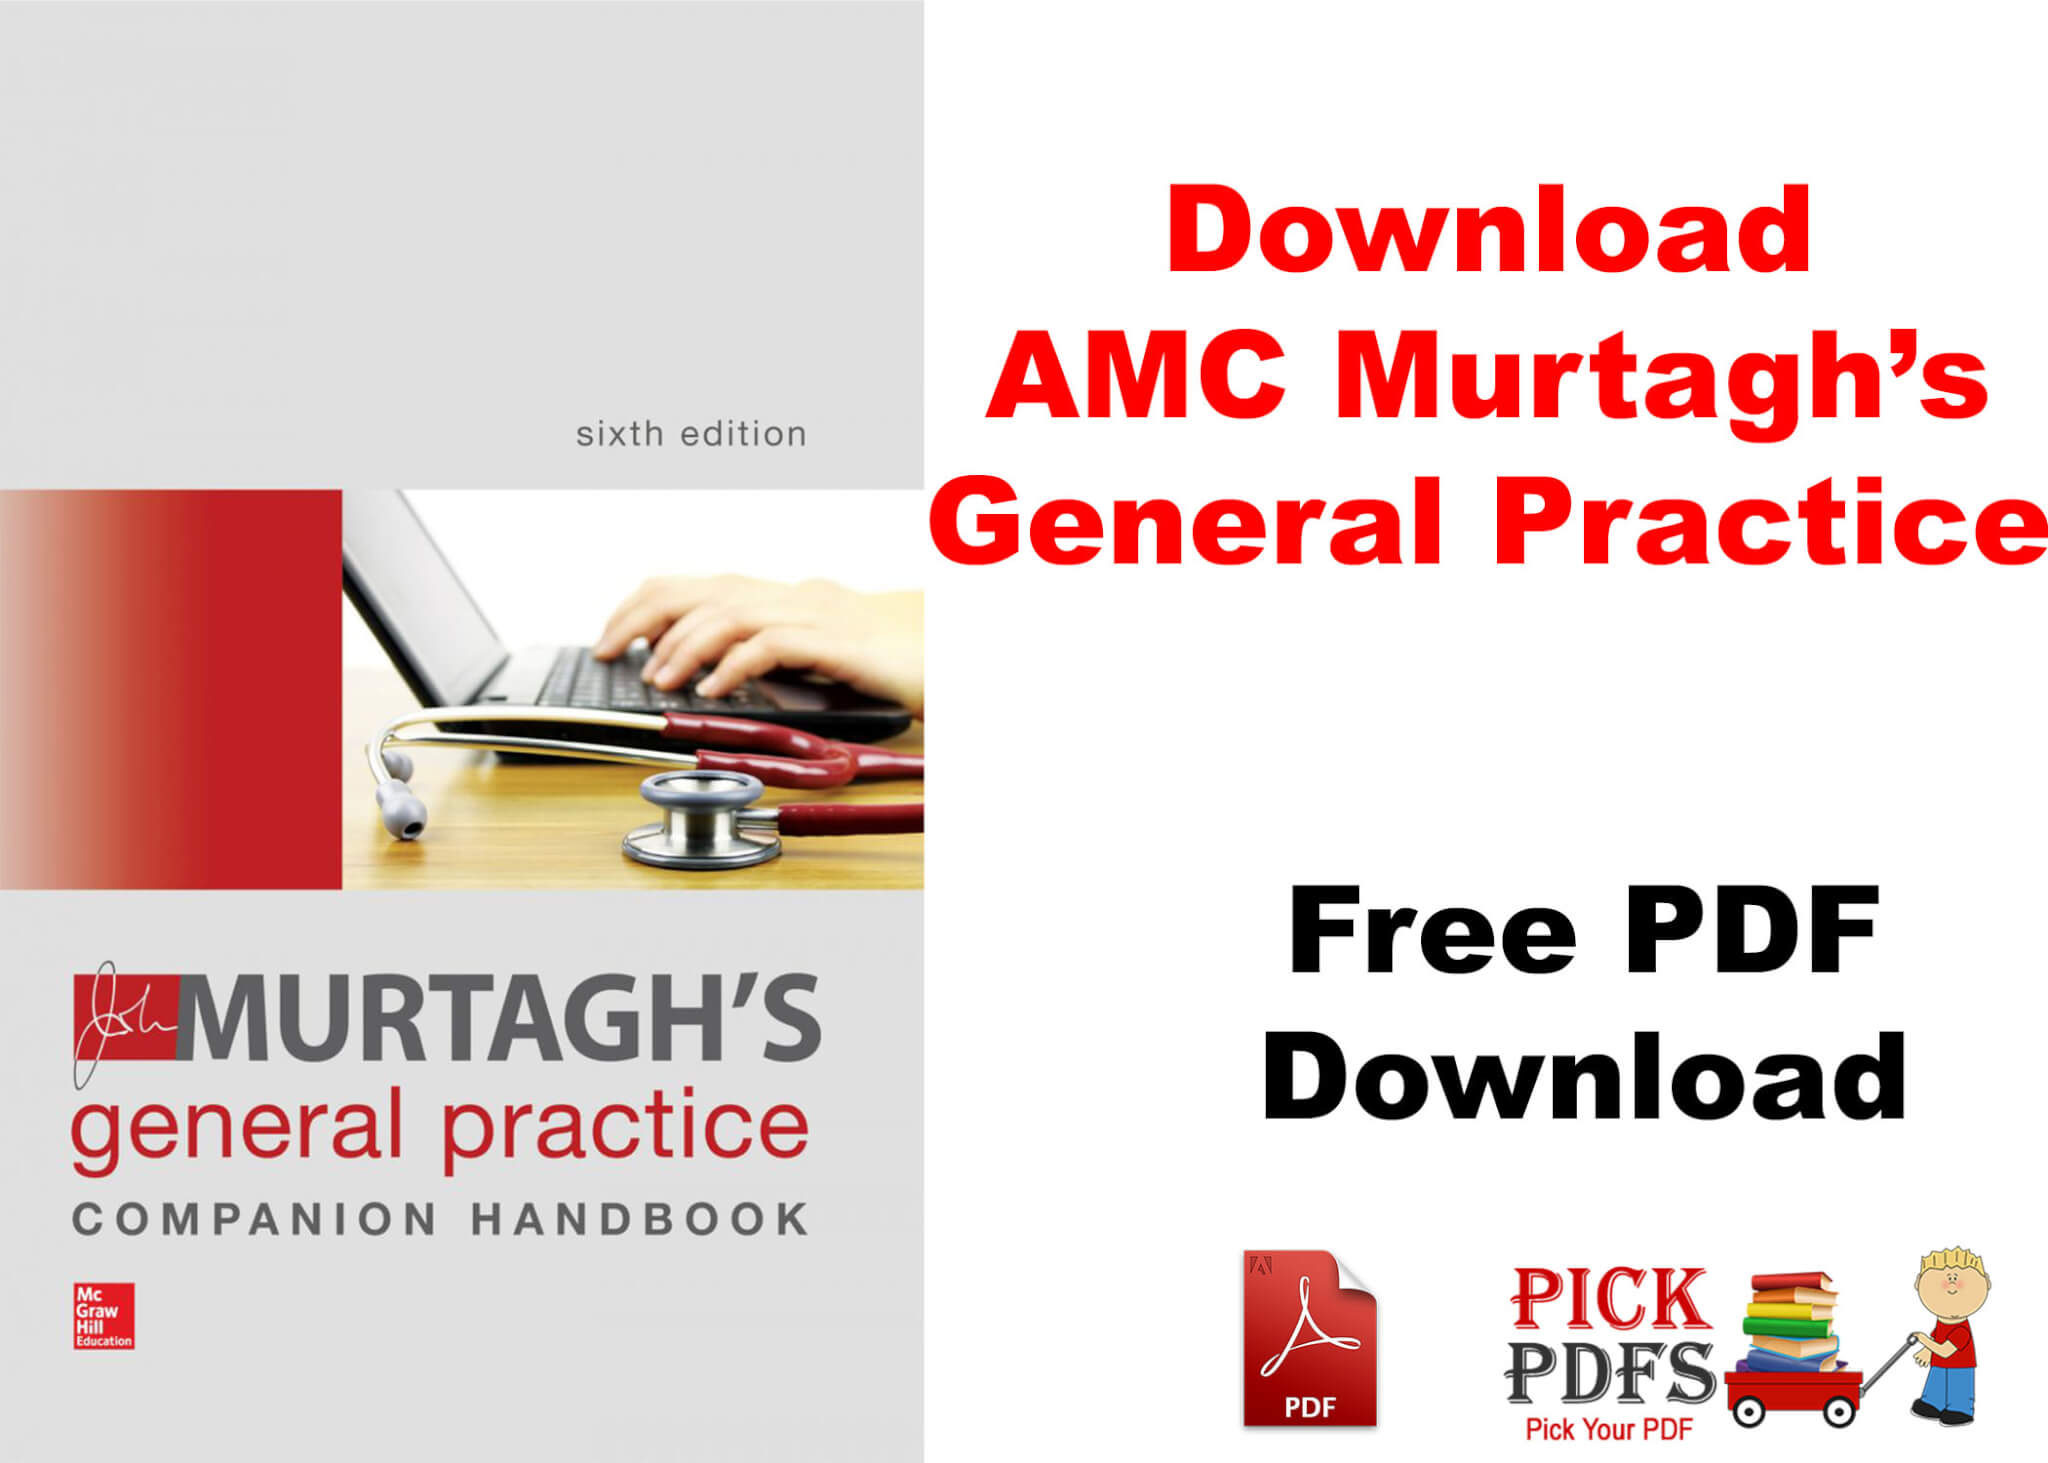 amc free pdf download